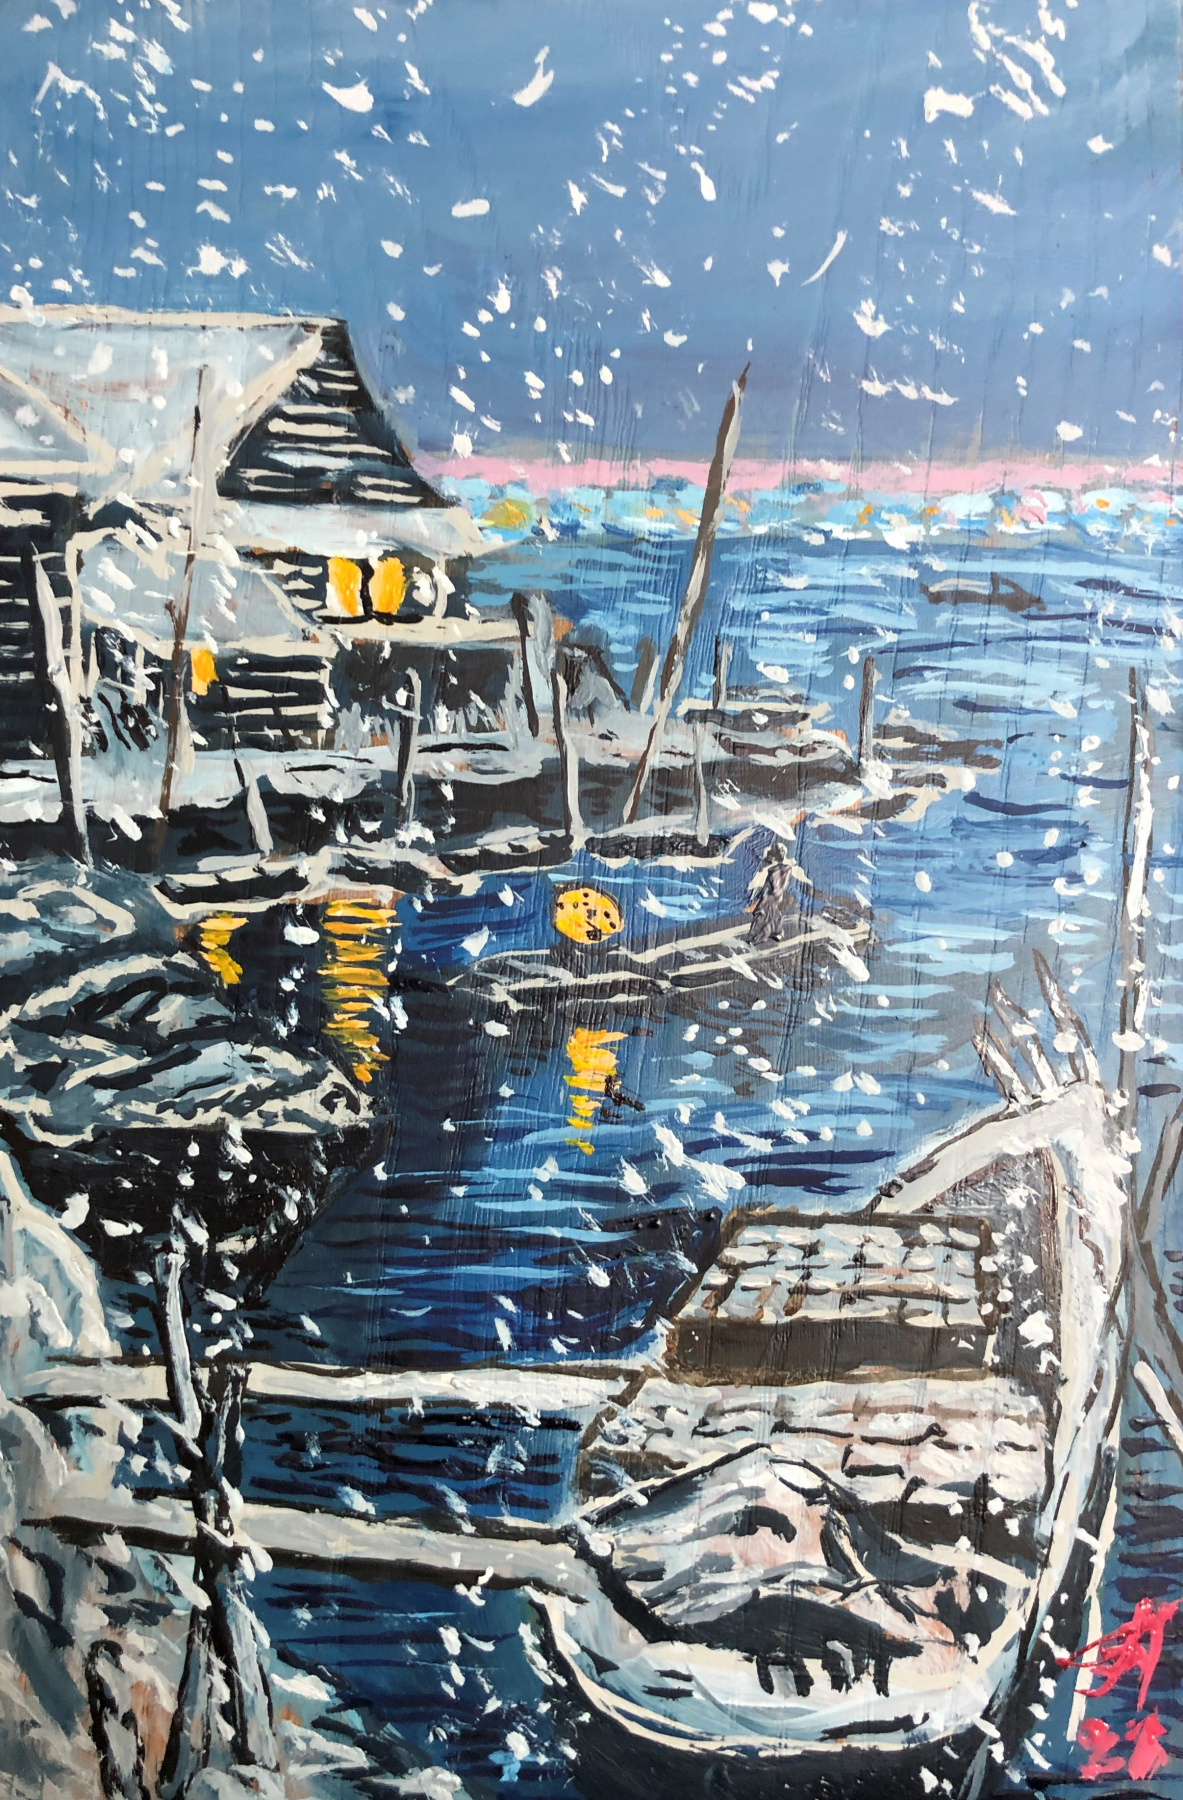 Sergey Vladimirovich Sebini. Зимний пейзаж с лодкой на тему Касуи Хавасе